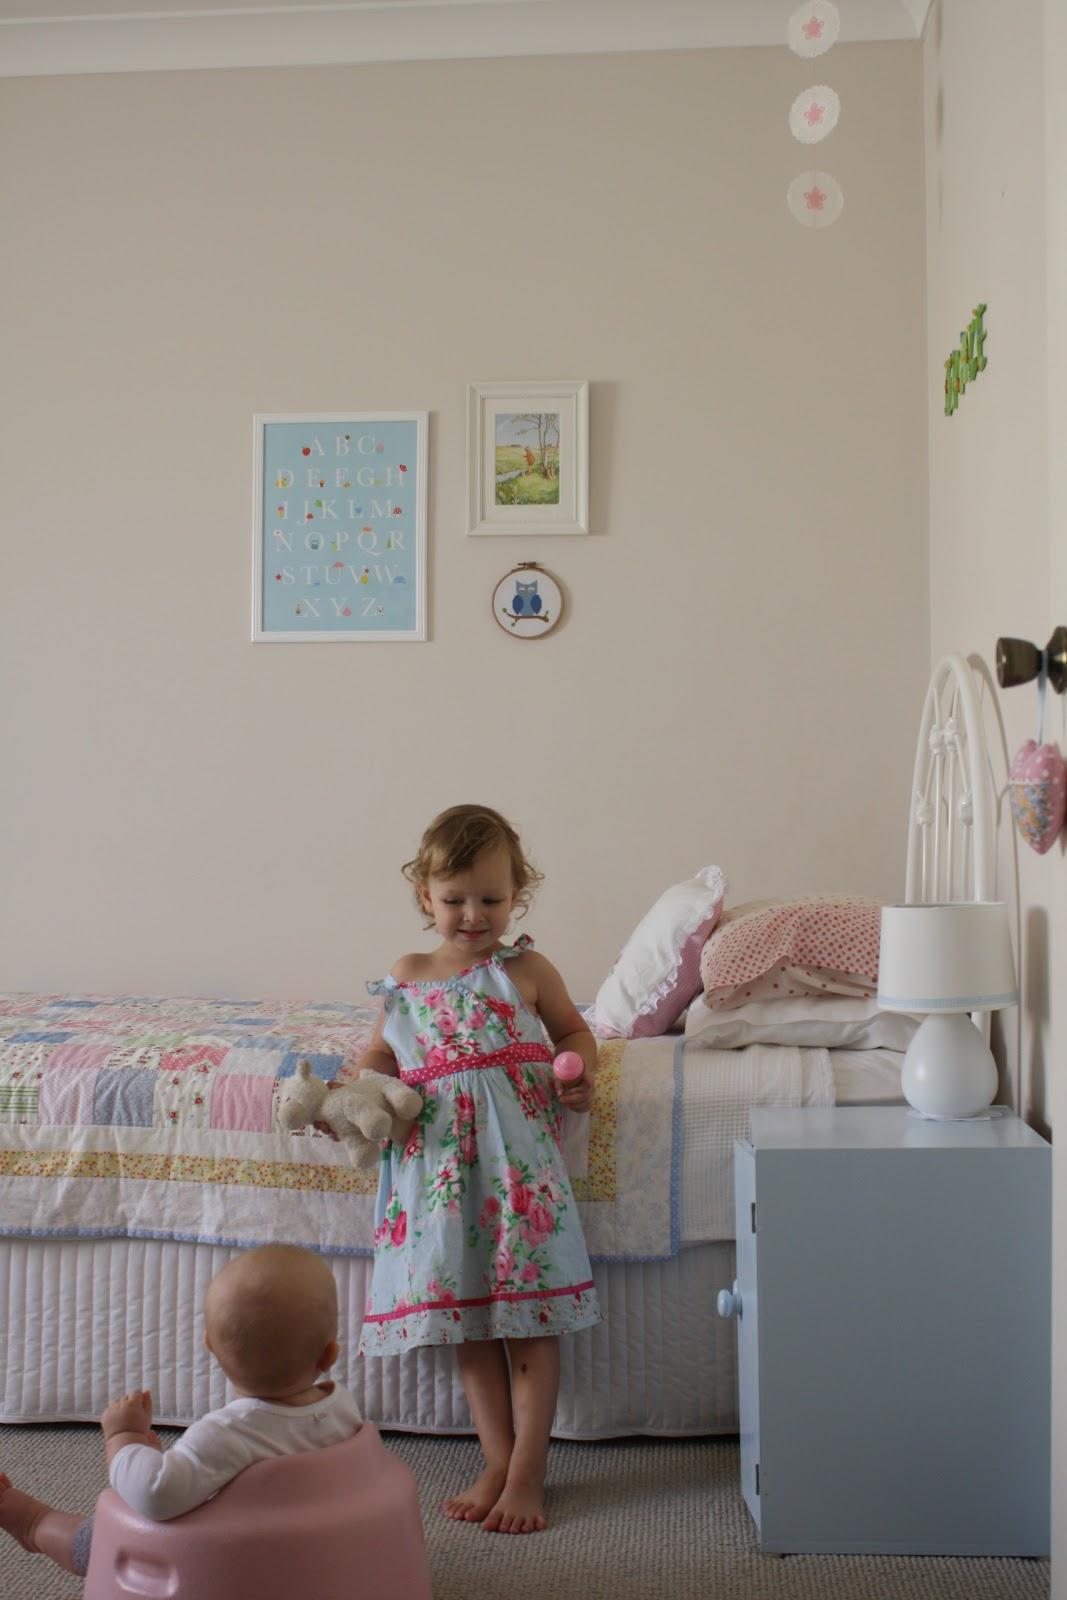 Graceu0027s Bedroom: Nursery To U0027Big Girlu0027s Roomu0027 Makeover